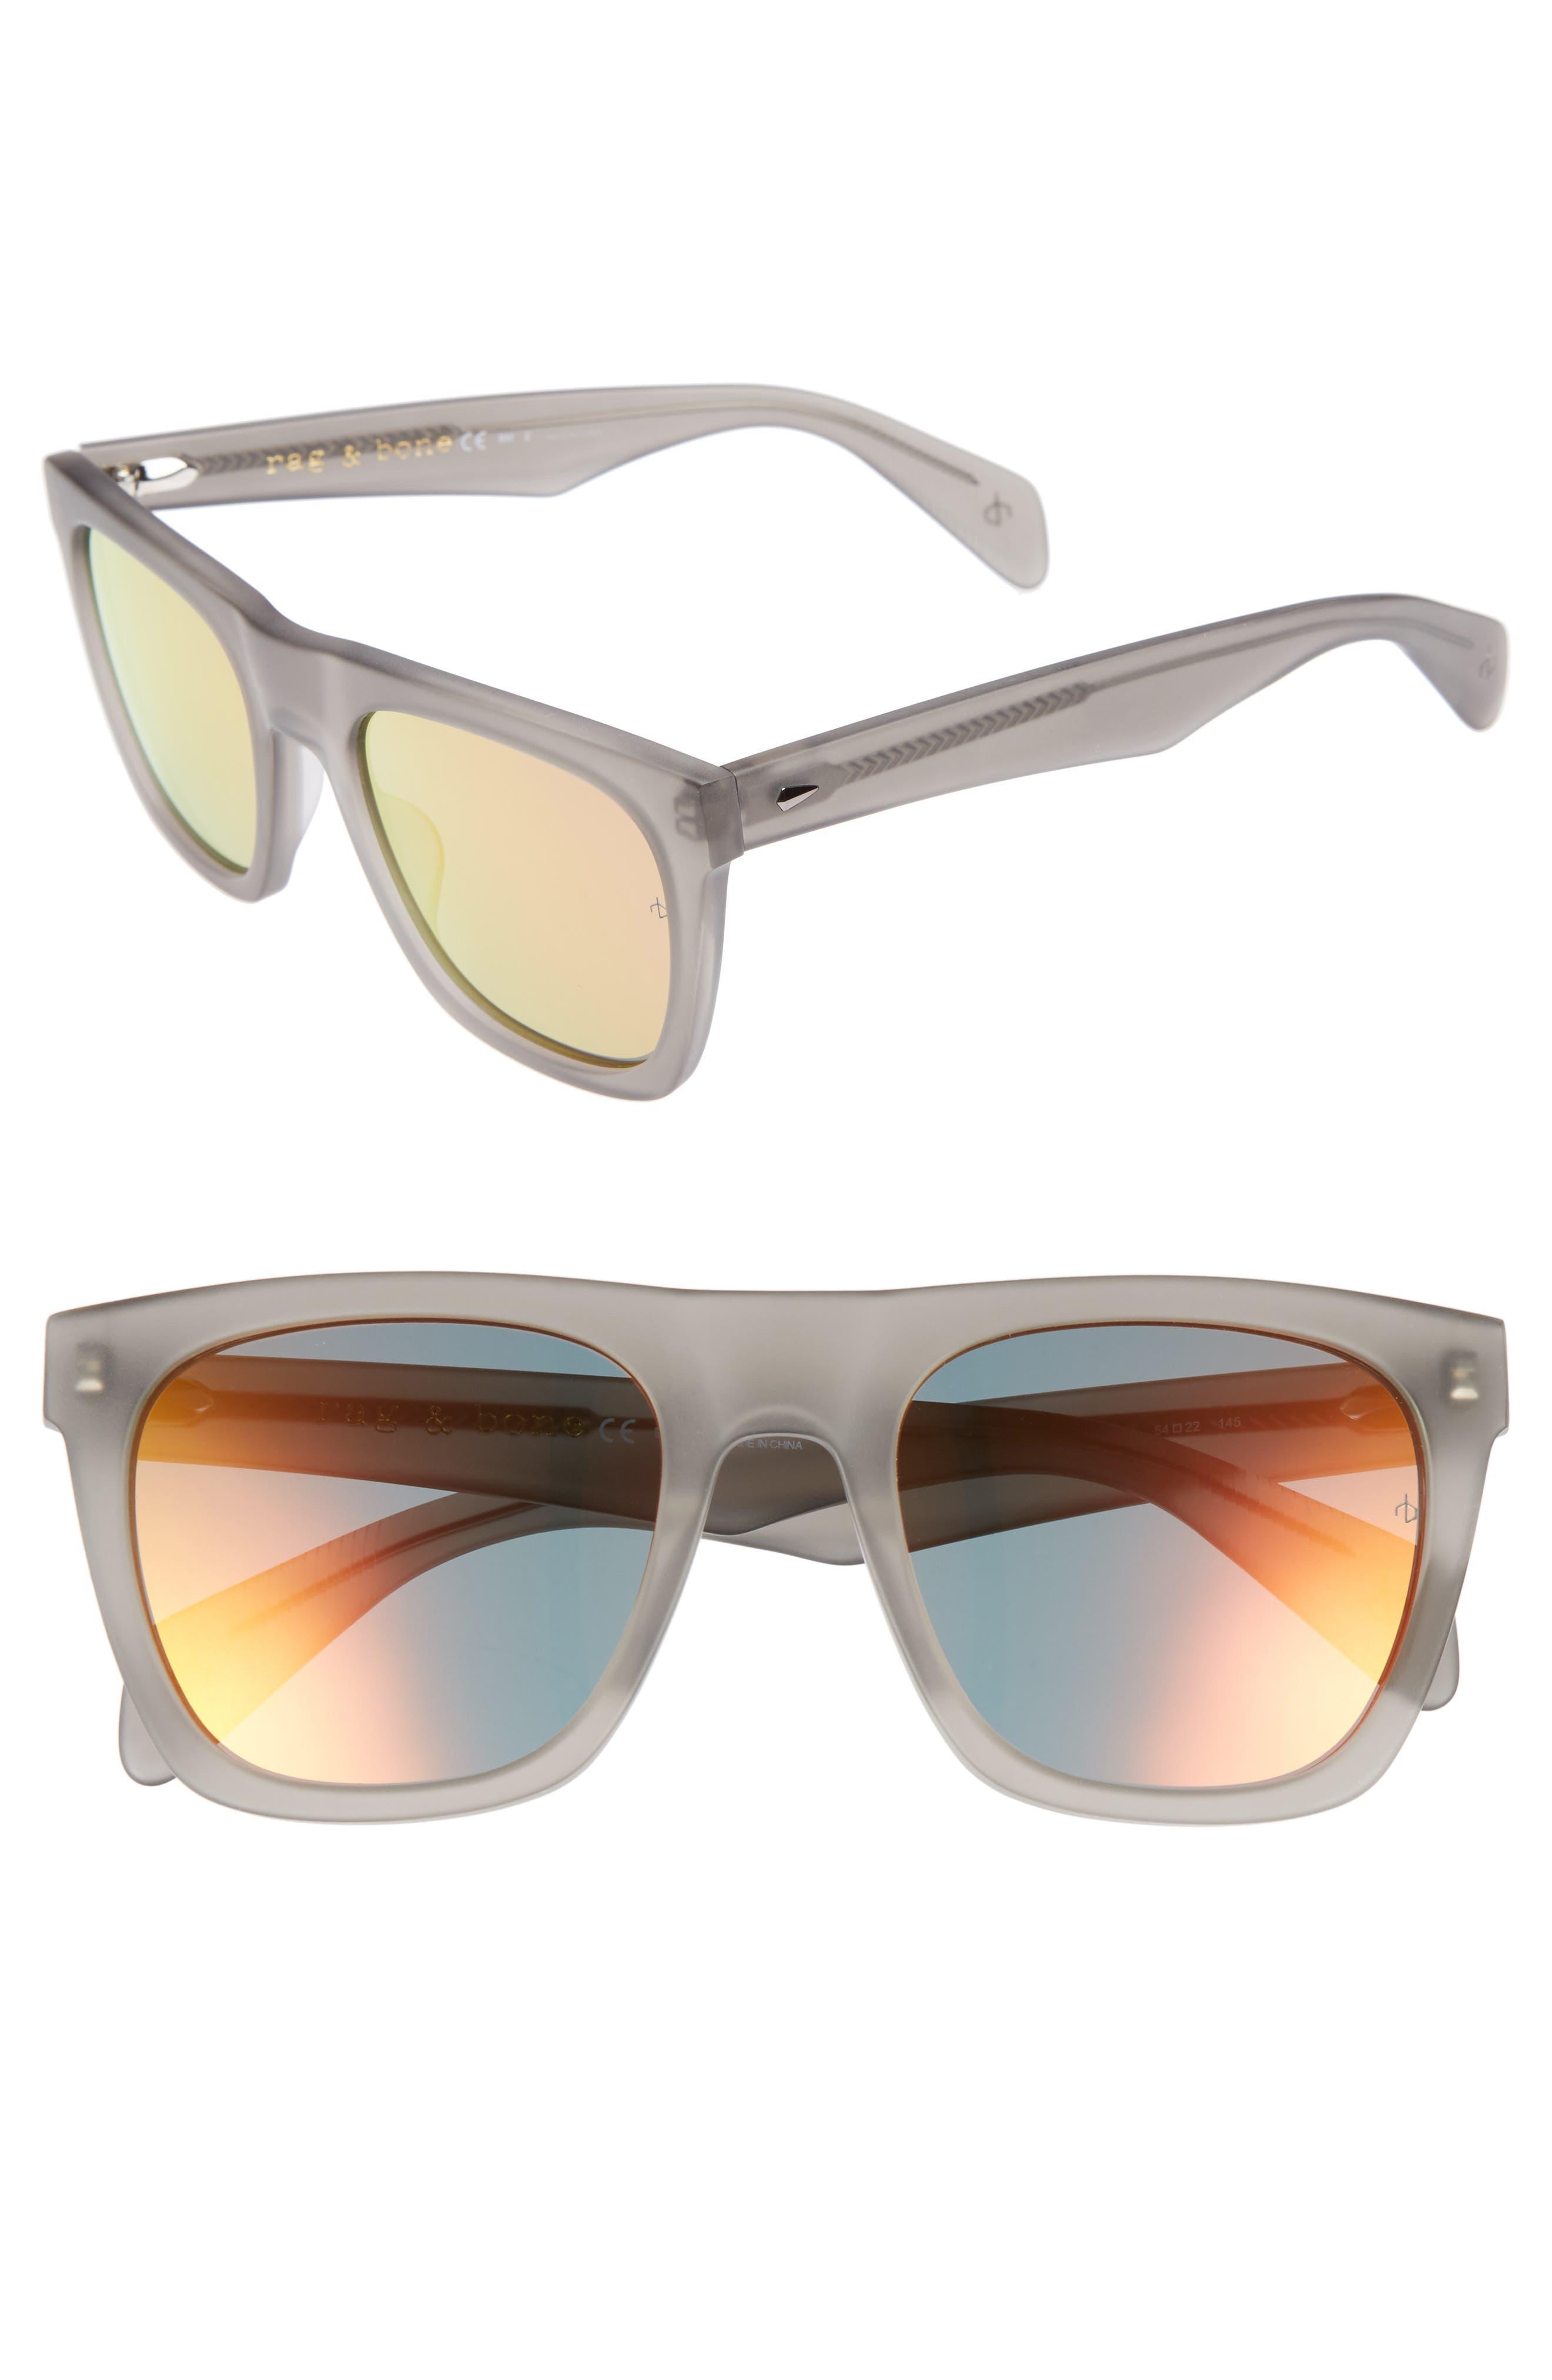 54mm Mirrored Sunglasses,                         Main,                         color, Matte Grey